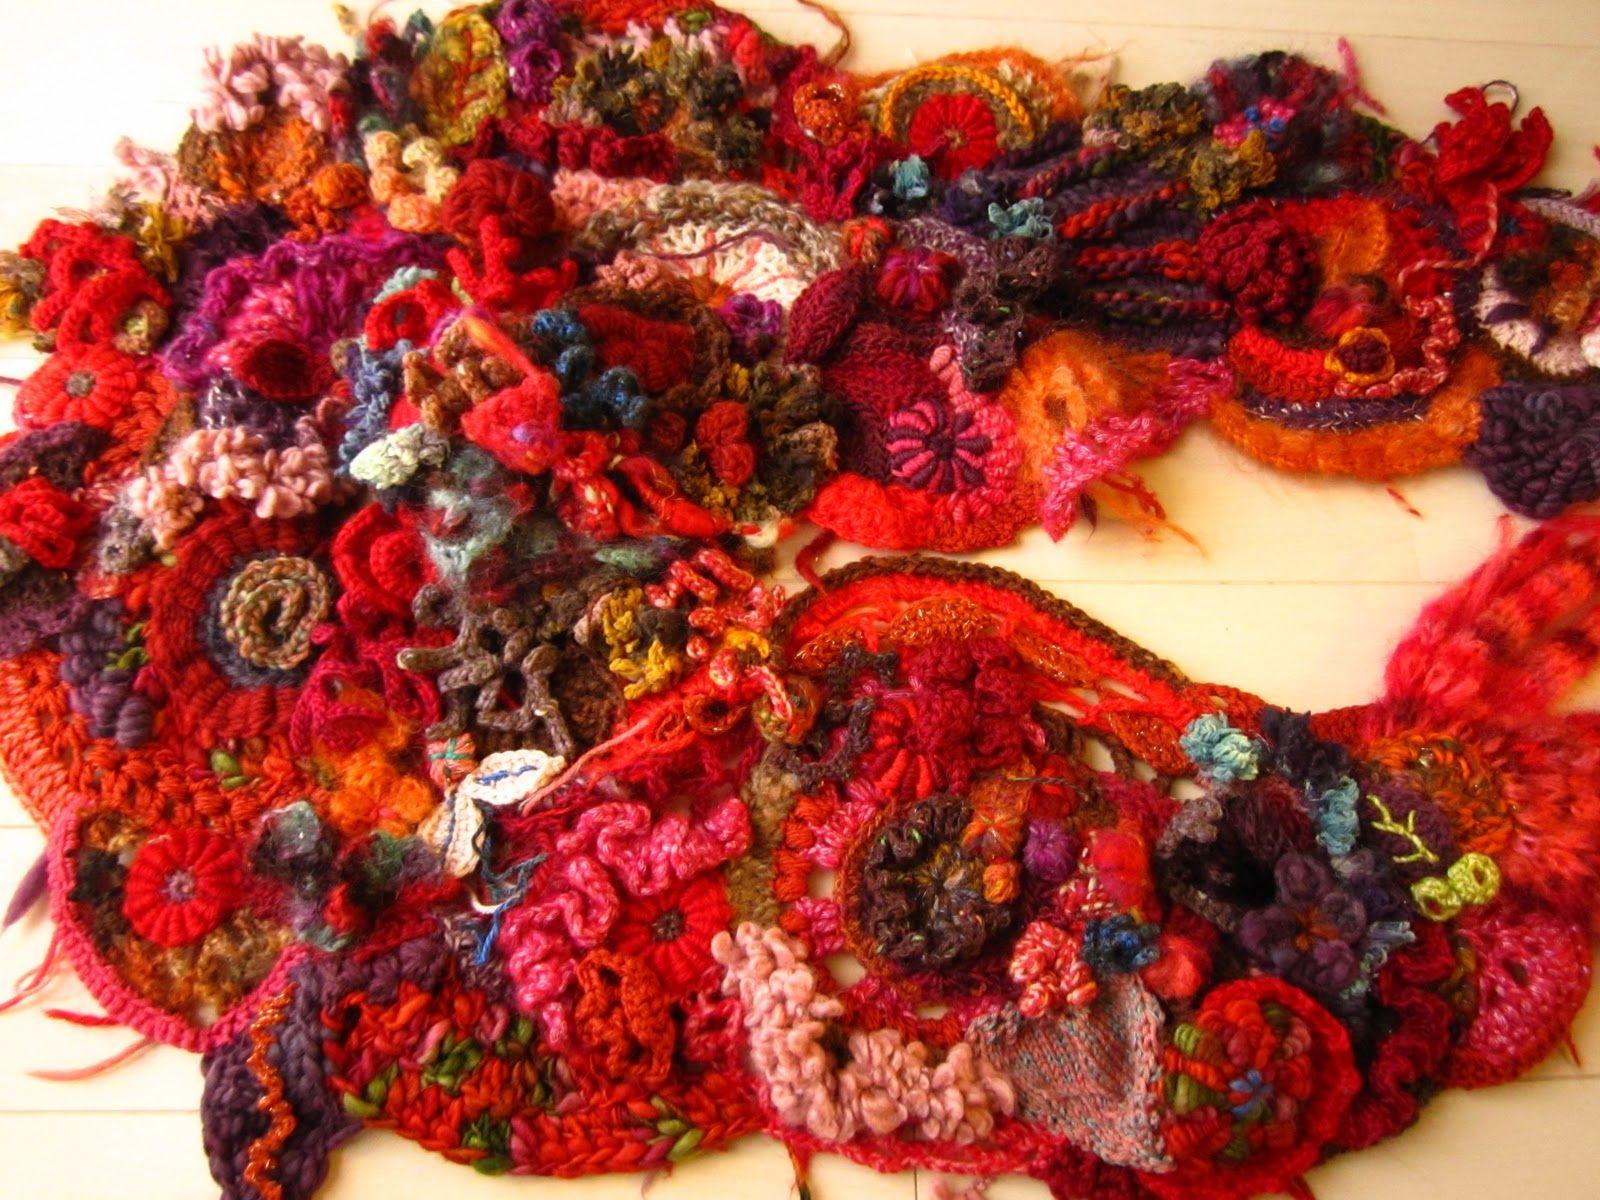 freeform crochet http://chikkyknit.blogspot.jp/2010/12/deep-blue-coral-red.html?m=1